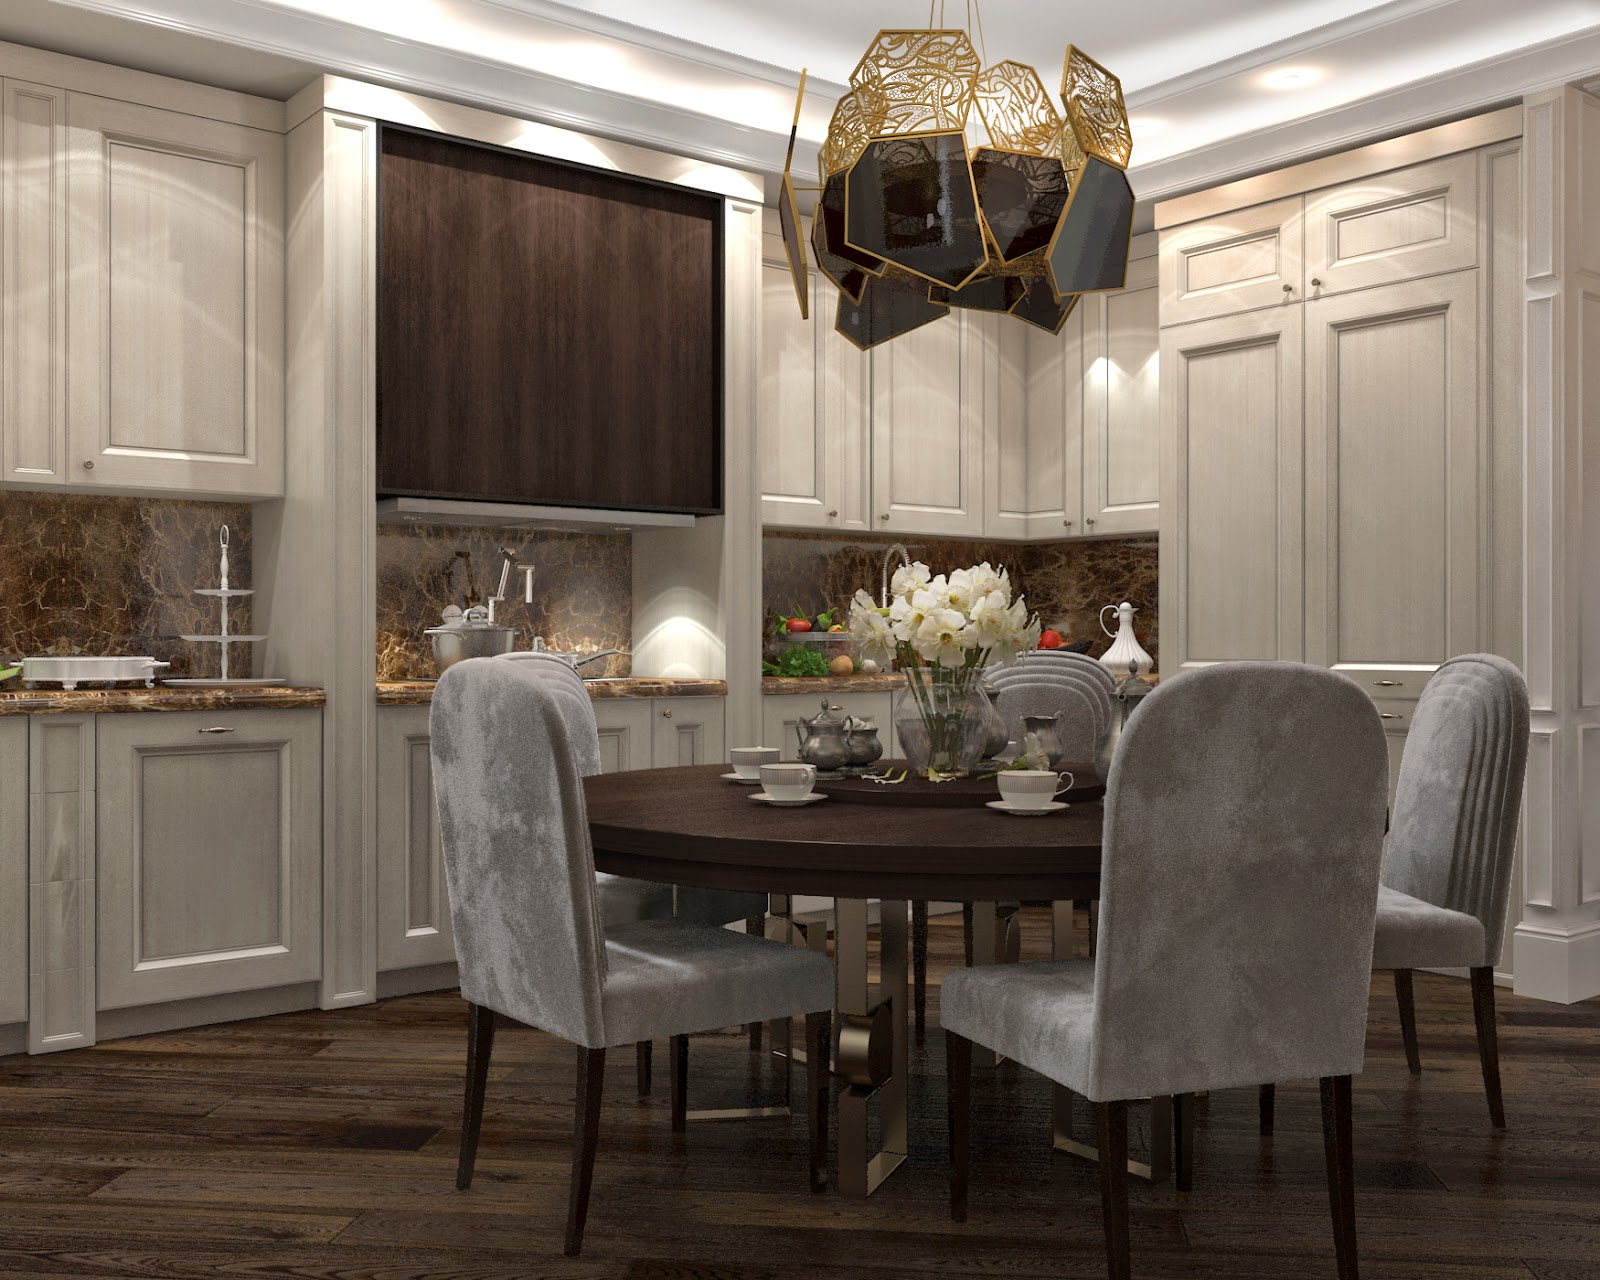 Darya girina interior design march 2015 - Sitting Room And Kitchen